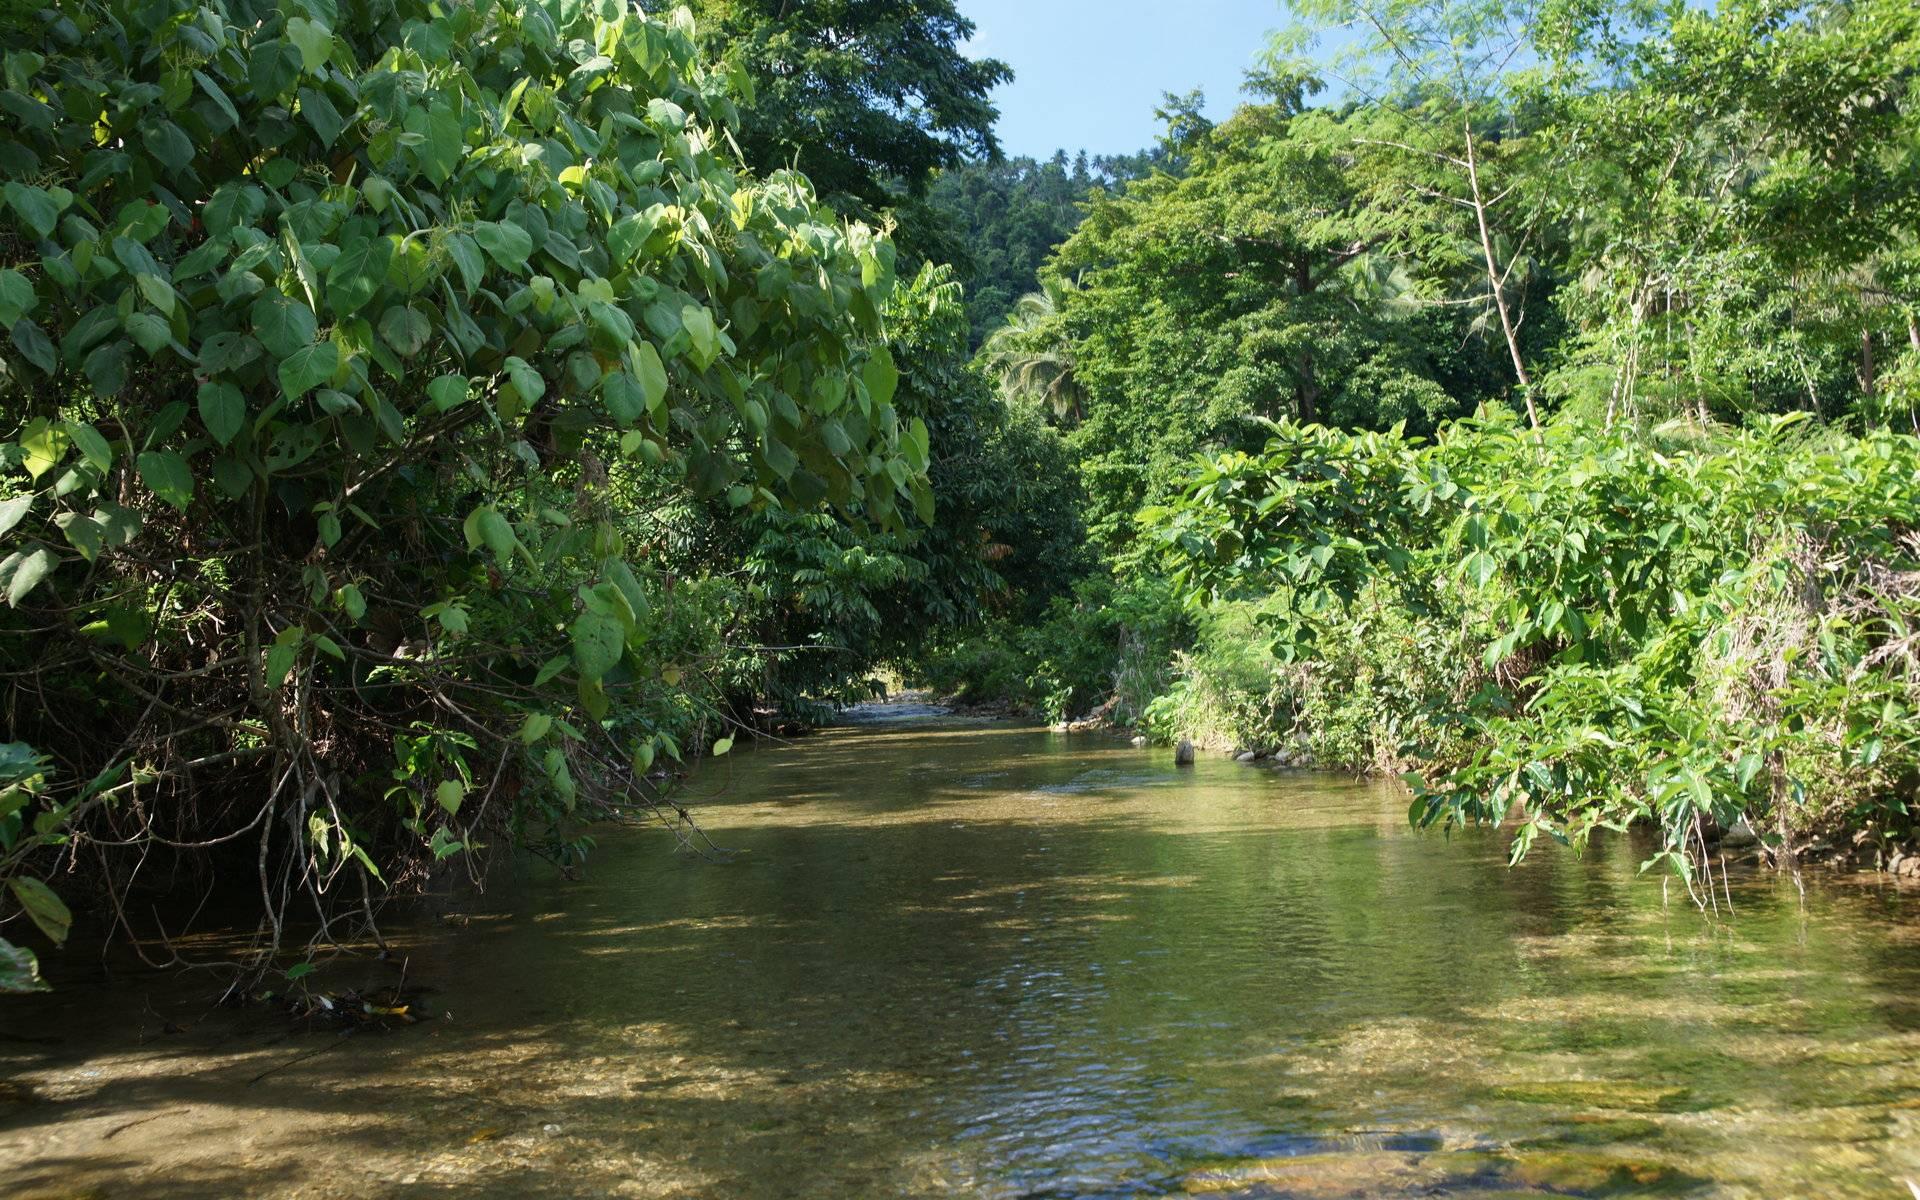 Jungle Vegetation Scenery Background Nature River desktop wallpapers 1920x1200